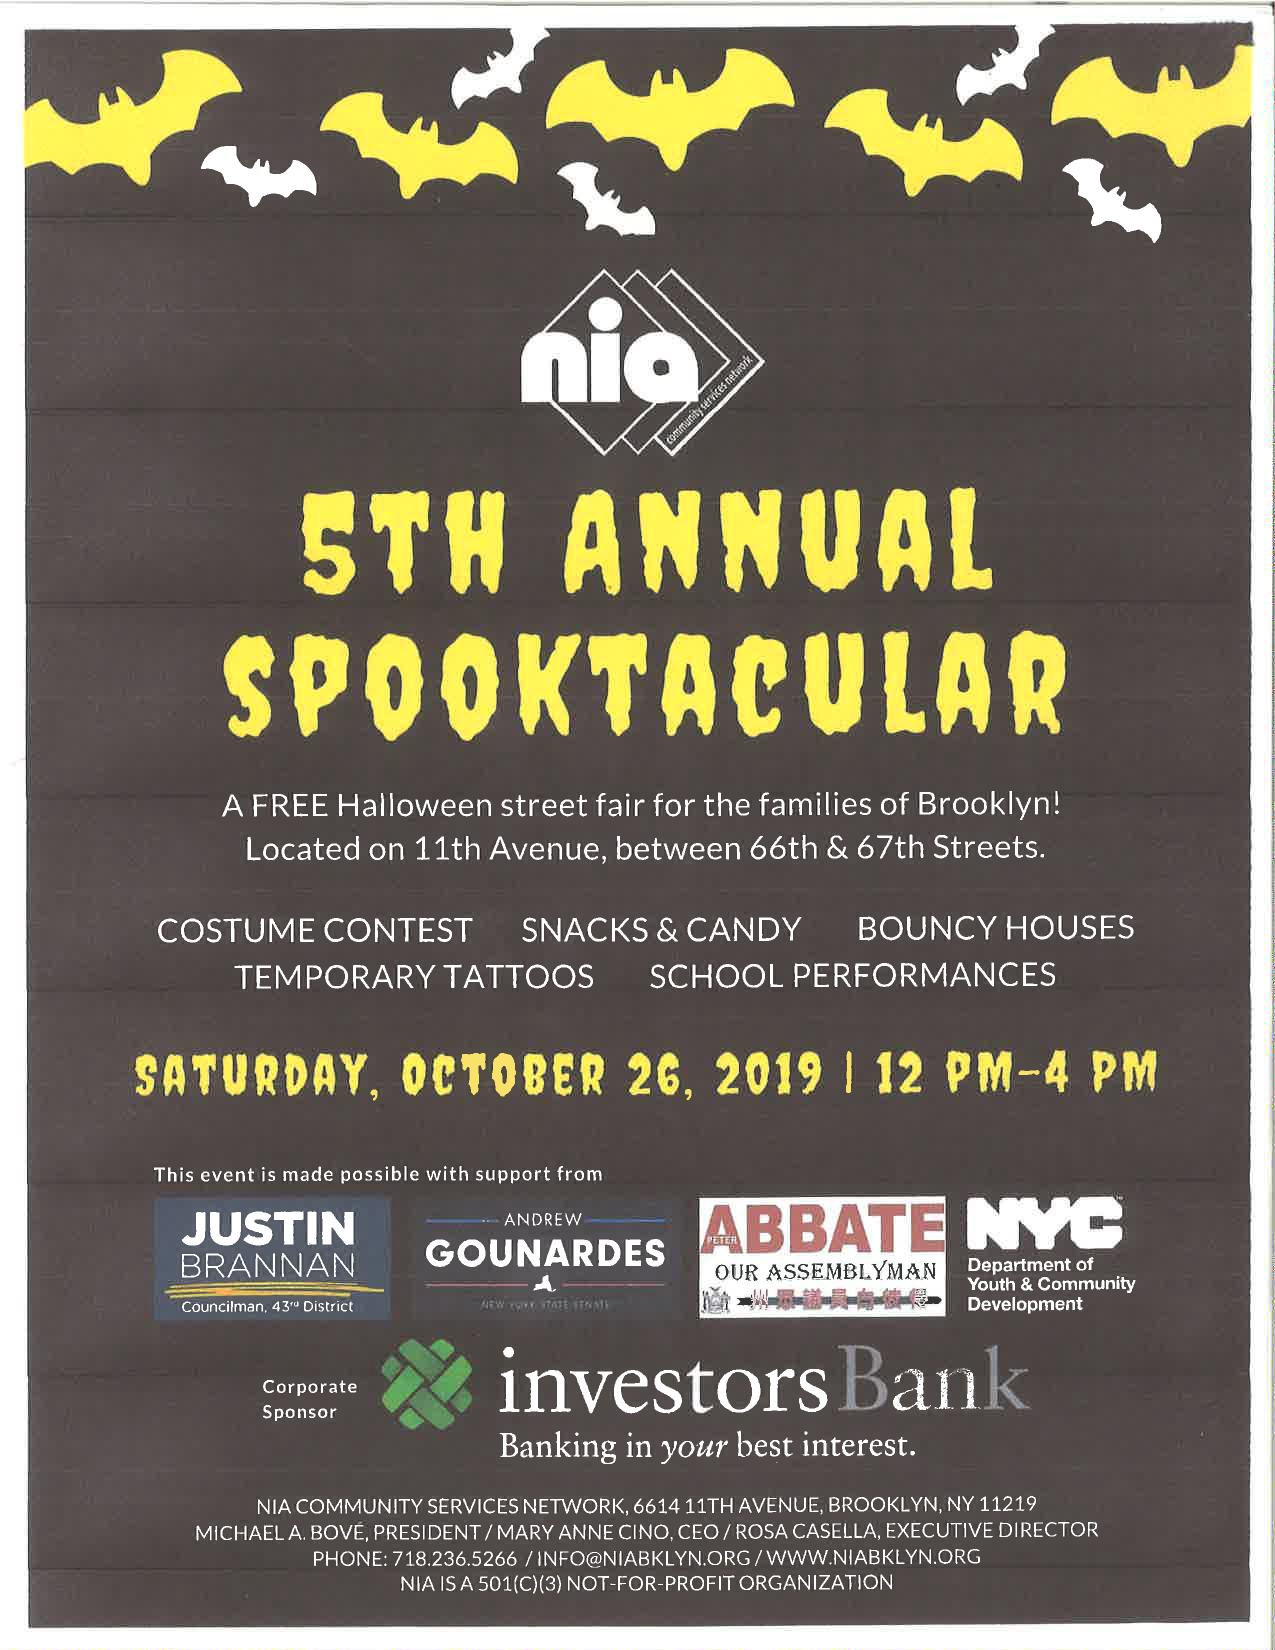 Saturday, October 26th, 2019 | 12 PM - 4 PM - 5th Annual Spooktacular: